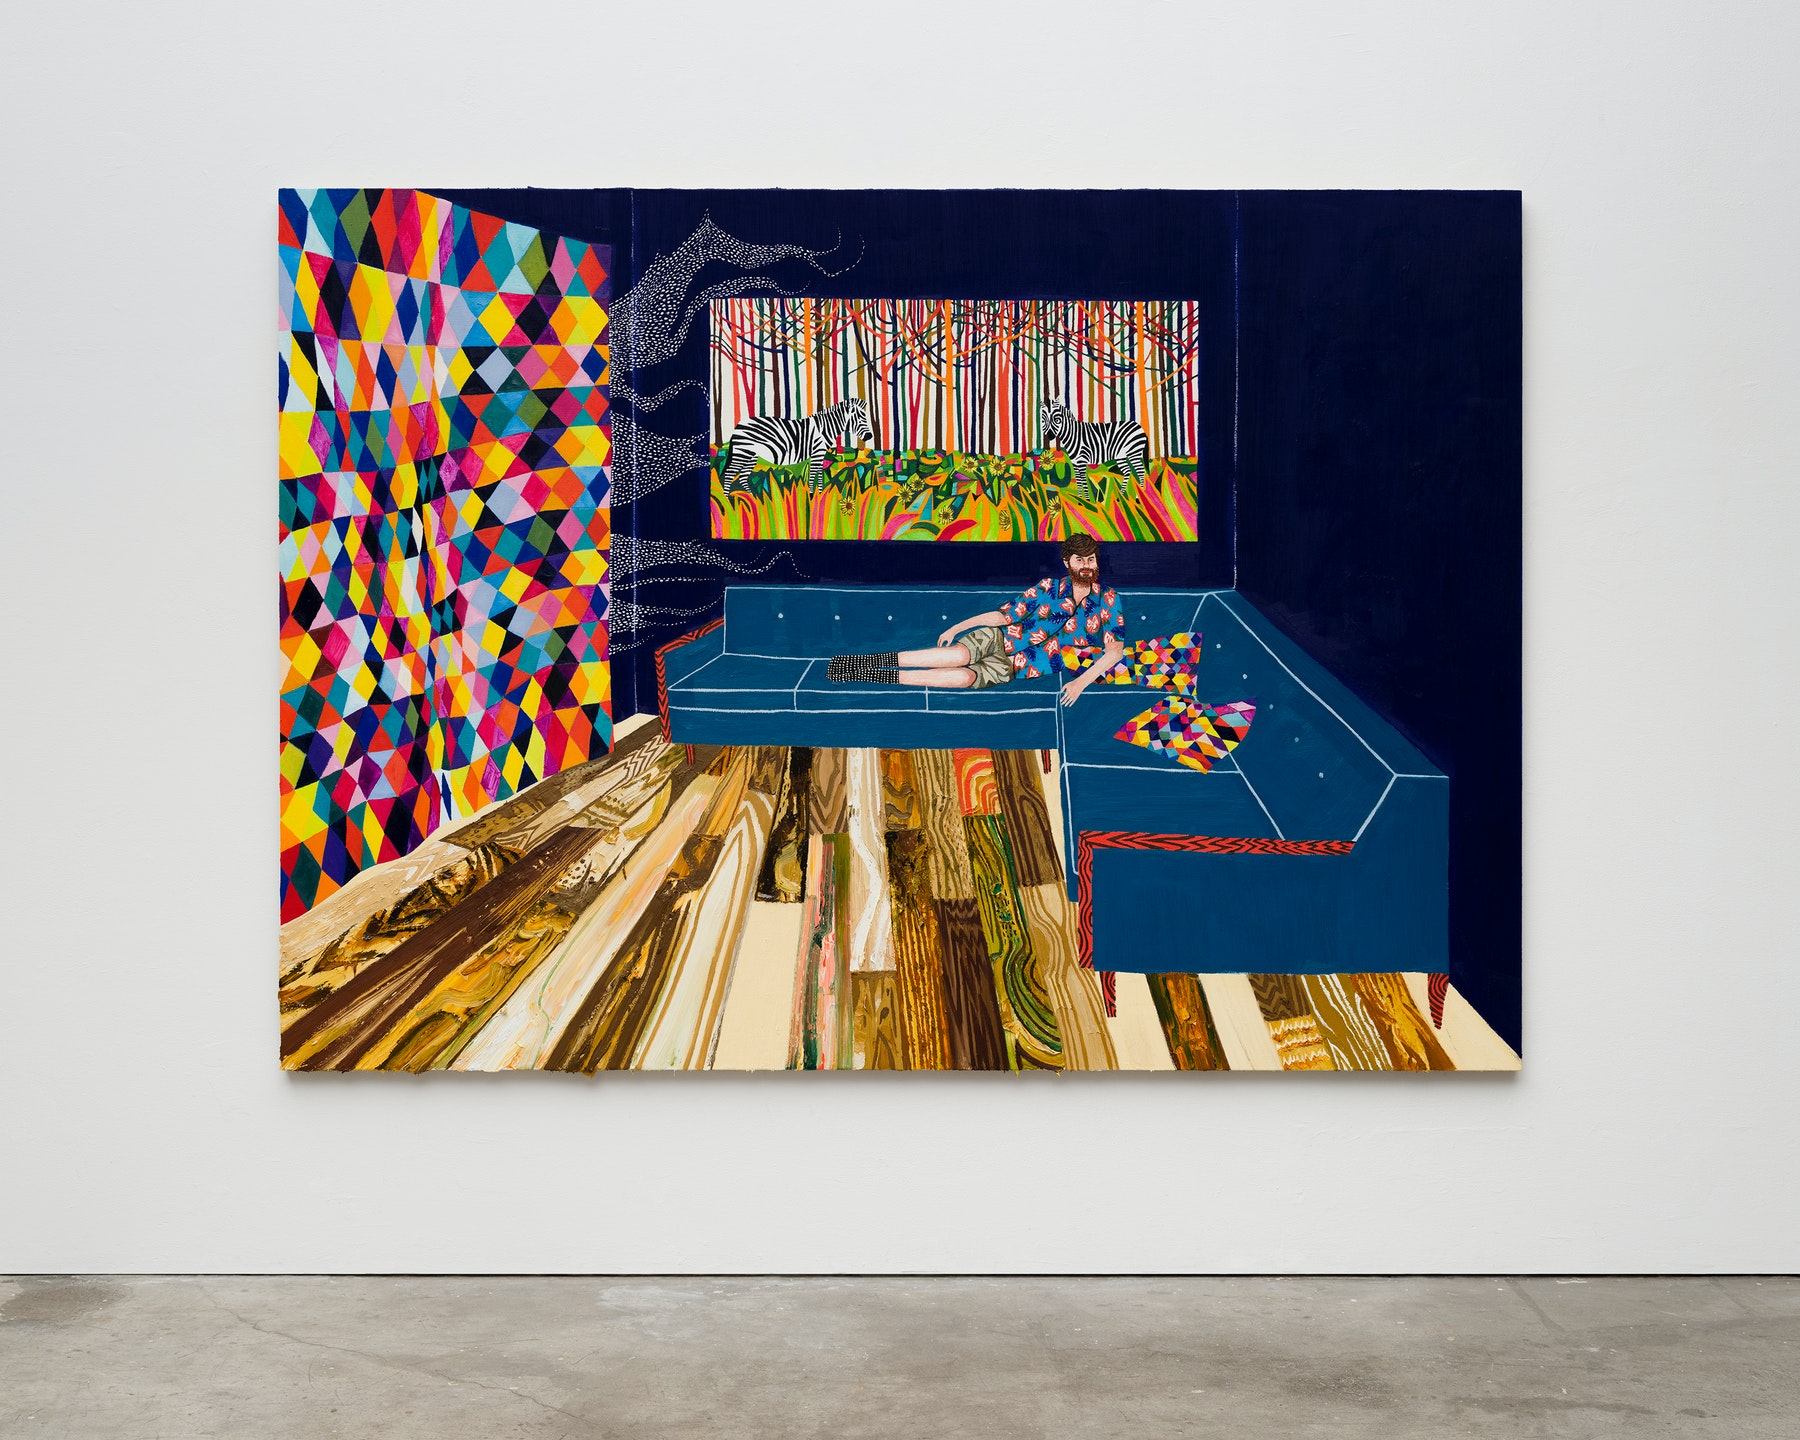 "Raffi Kalenderian ""Joe Barber,"" 2021 Oil on linen 70"" x 98"" [HxW] (177.8 x 248.92 cm) Inventory #KAL282 Courtesy of the artist and Vielmetter Los Angeles Photo credit: Fredrik Nilsen"